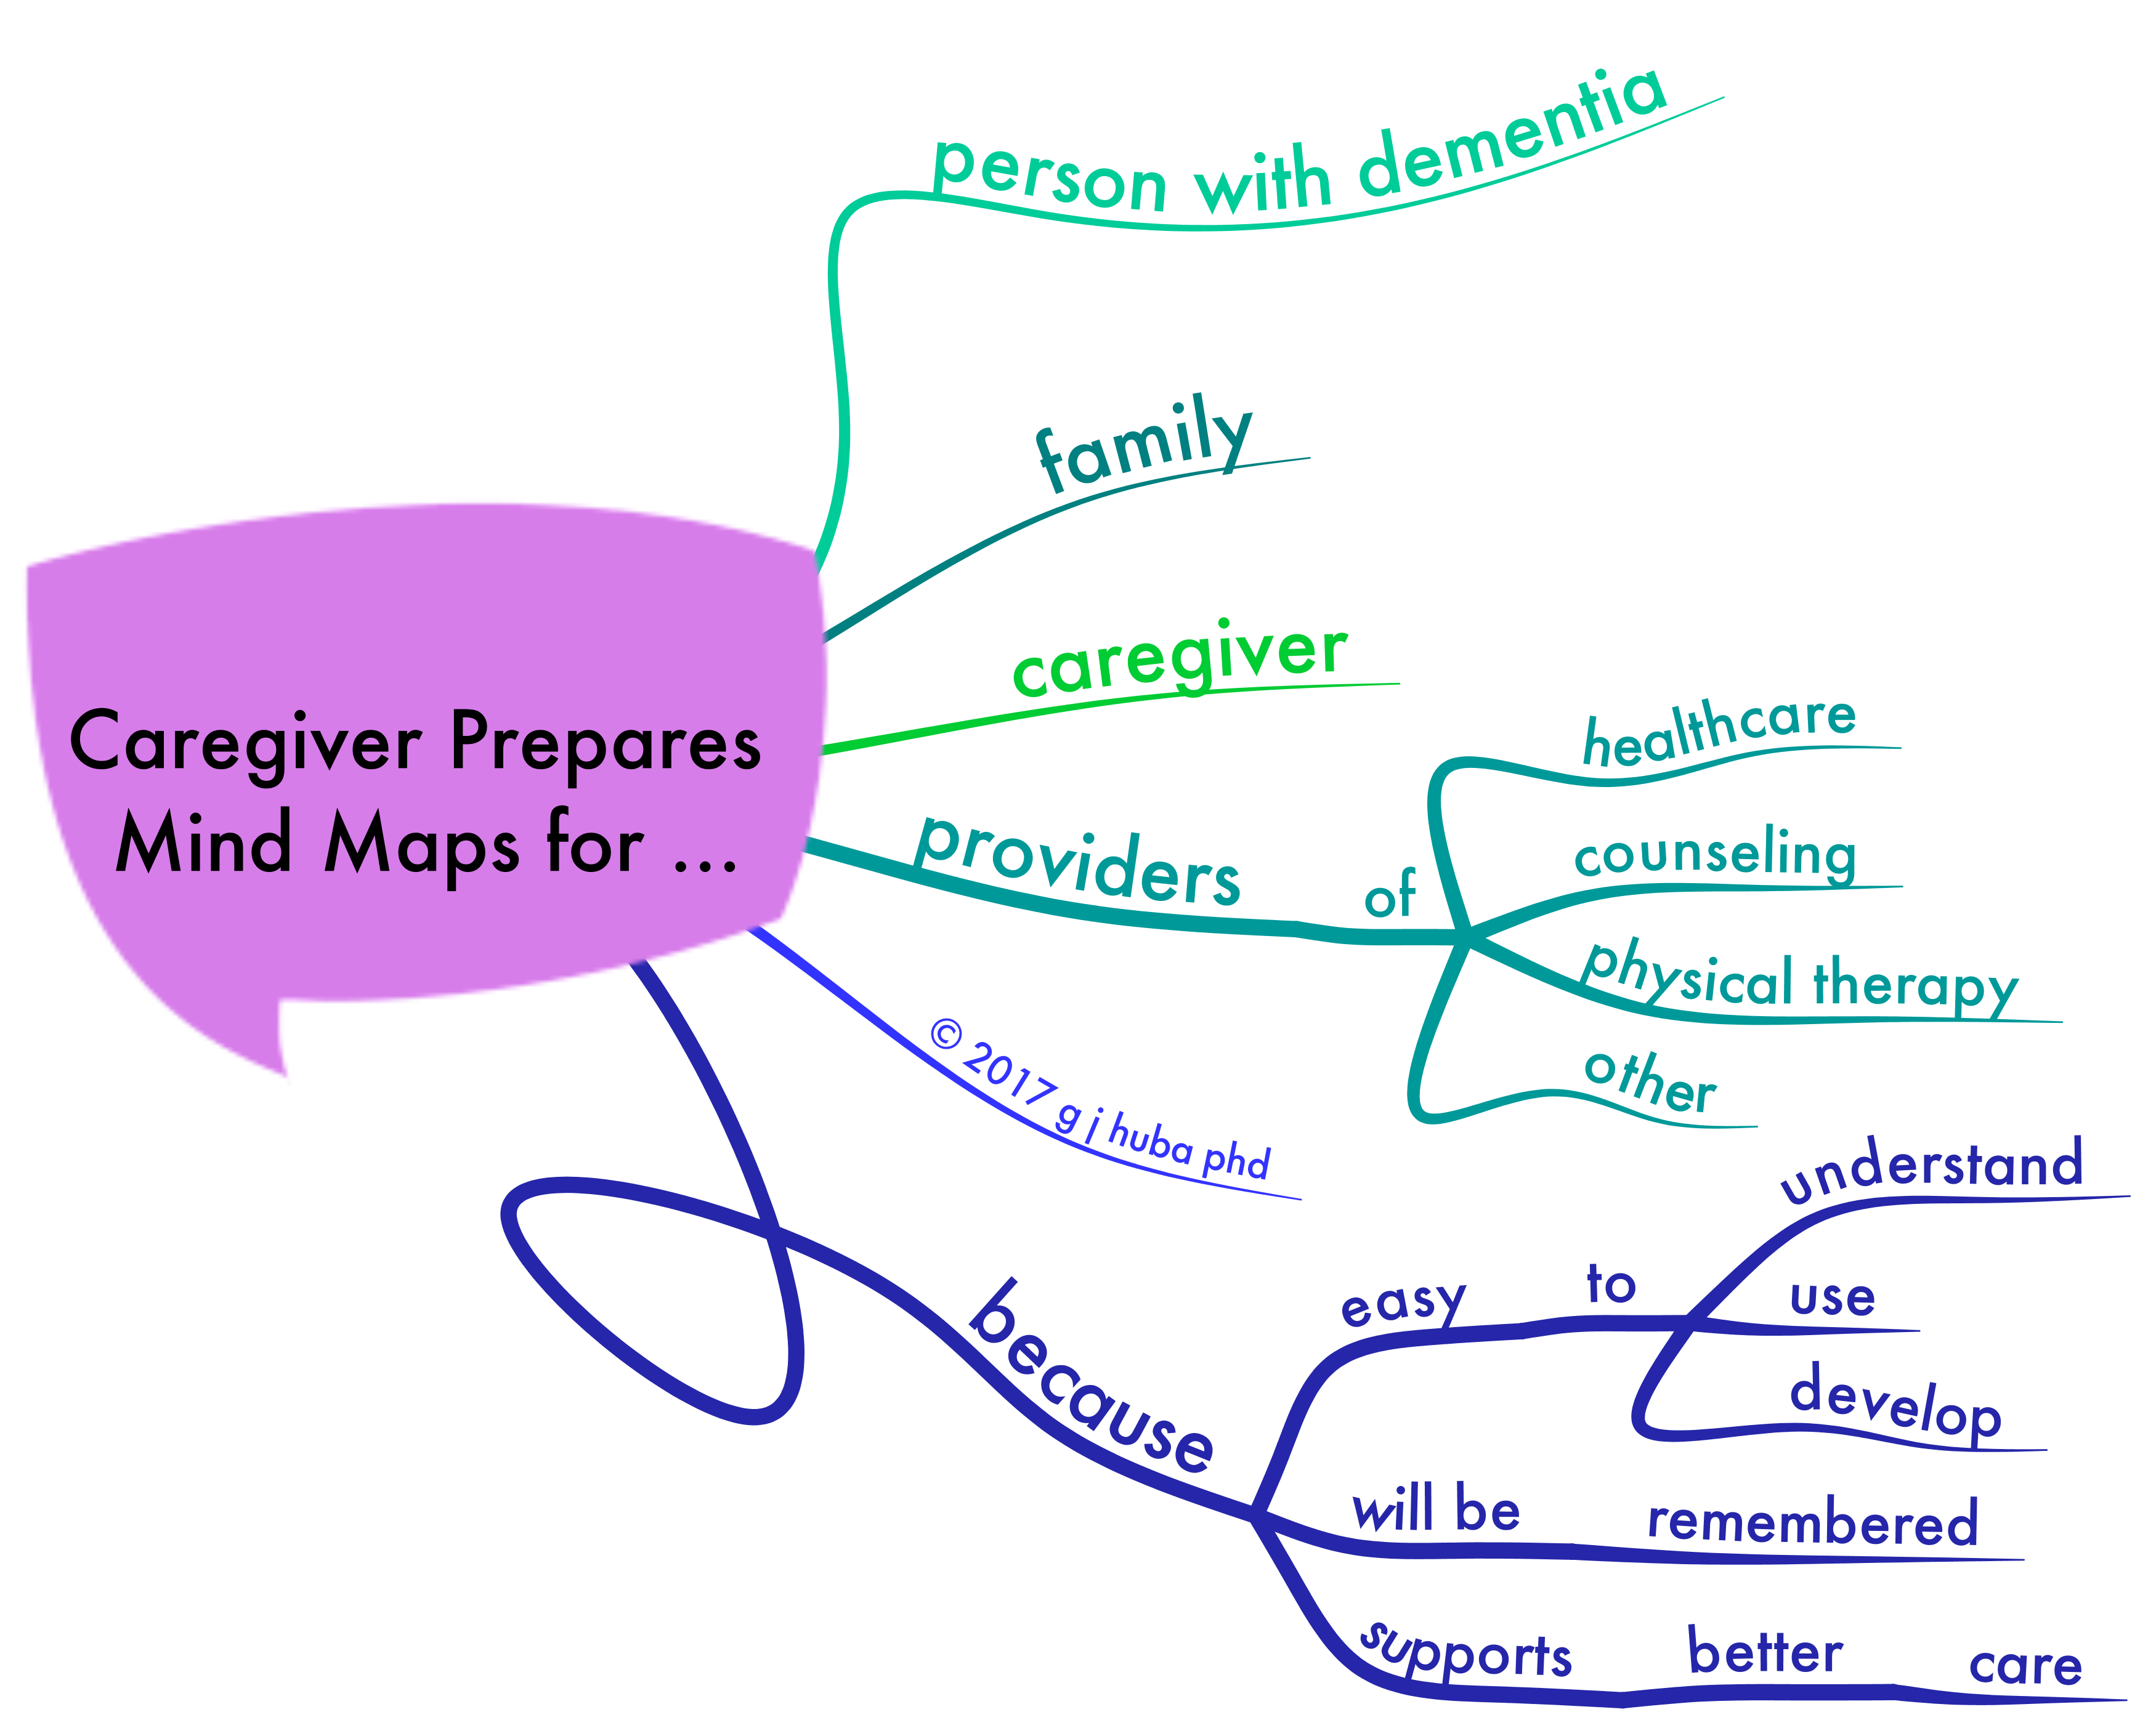 Caregiver Prepares Mind Maps for ...